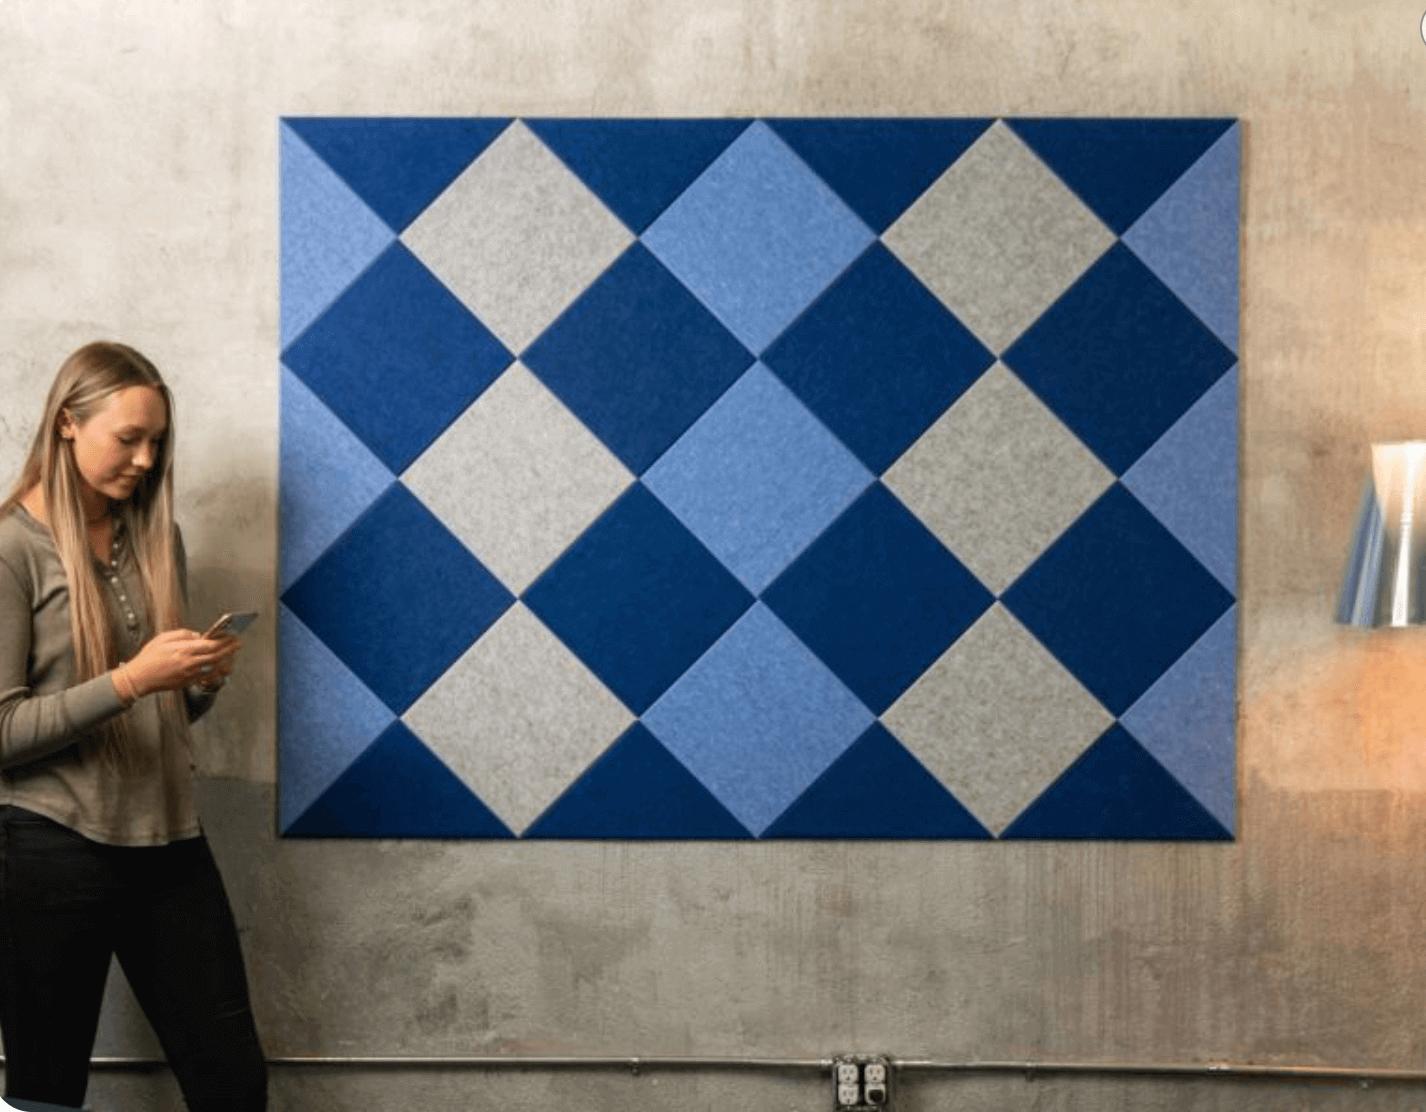 Blue argyle acoustic tile on wall